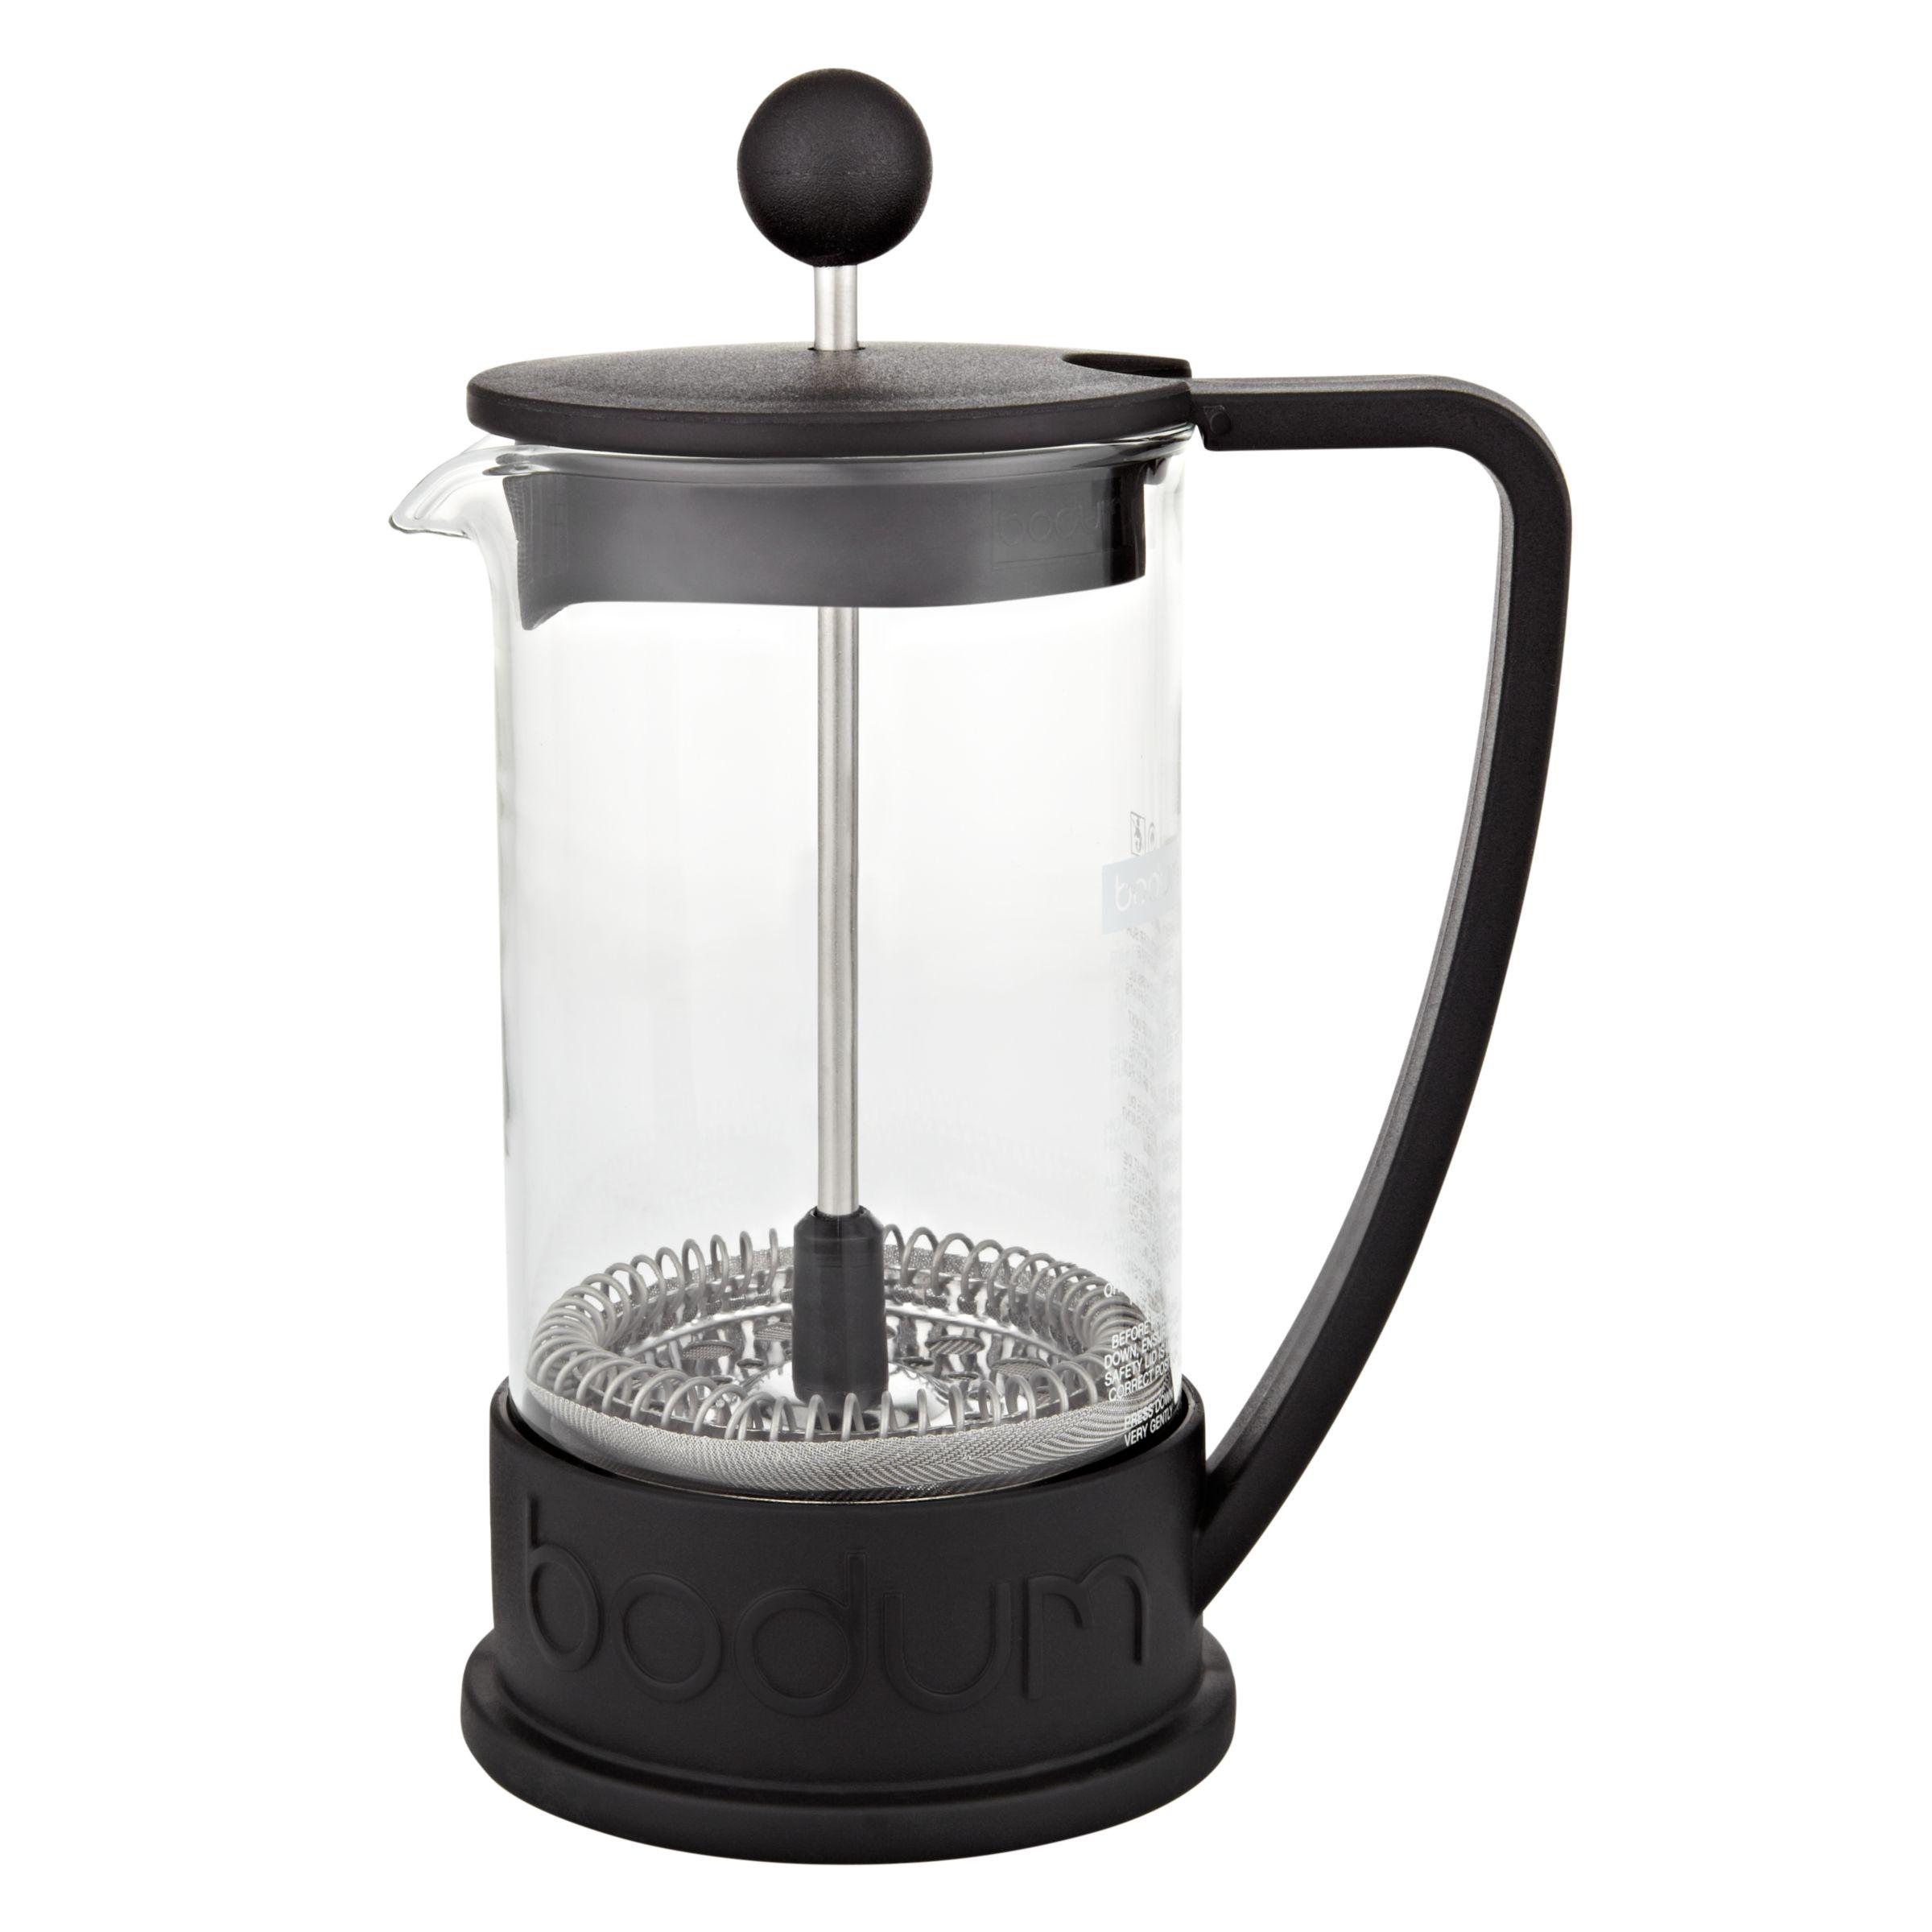 Bodum Bodum Brazil French Press Coffee Maker